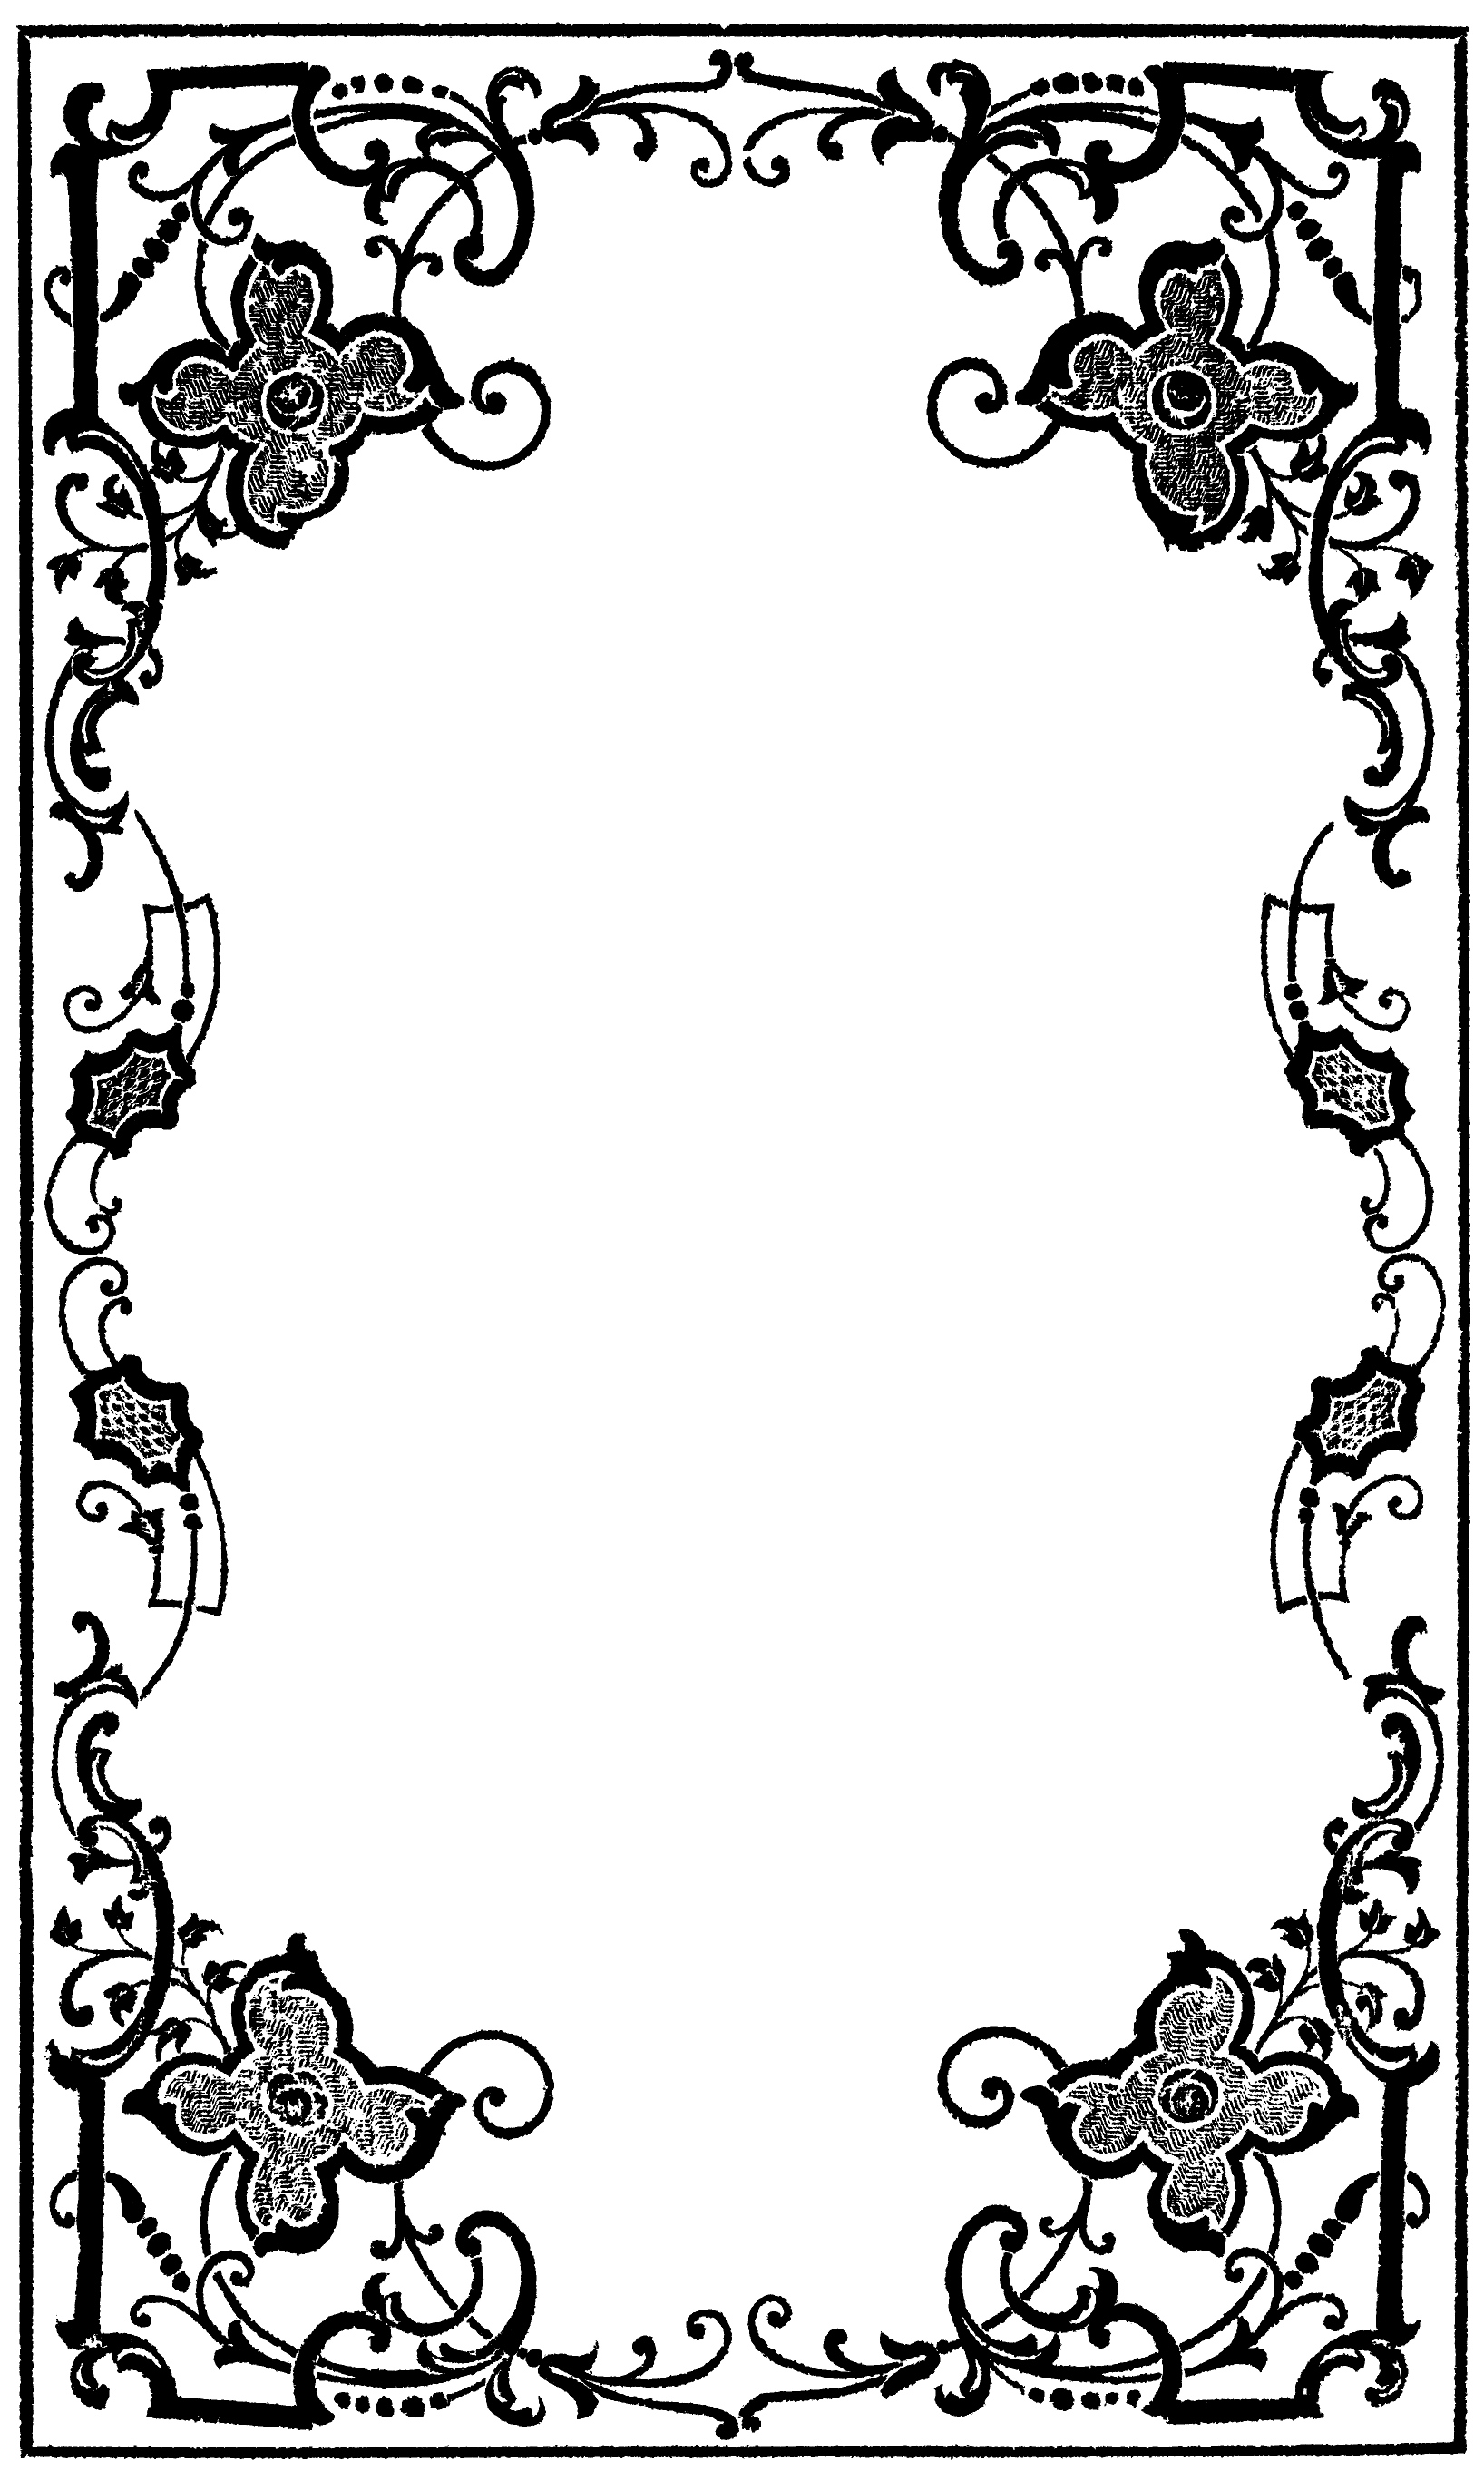 Victorian Clip Art Border Clipart Panda Free Clipart Images with Clip Art Victorian Borders